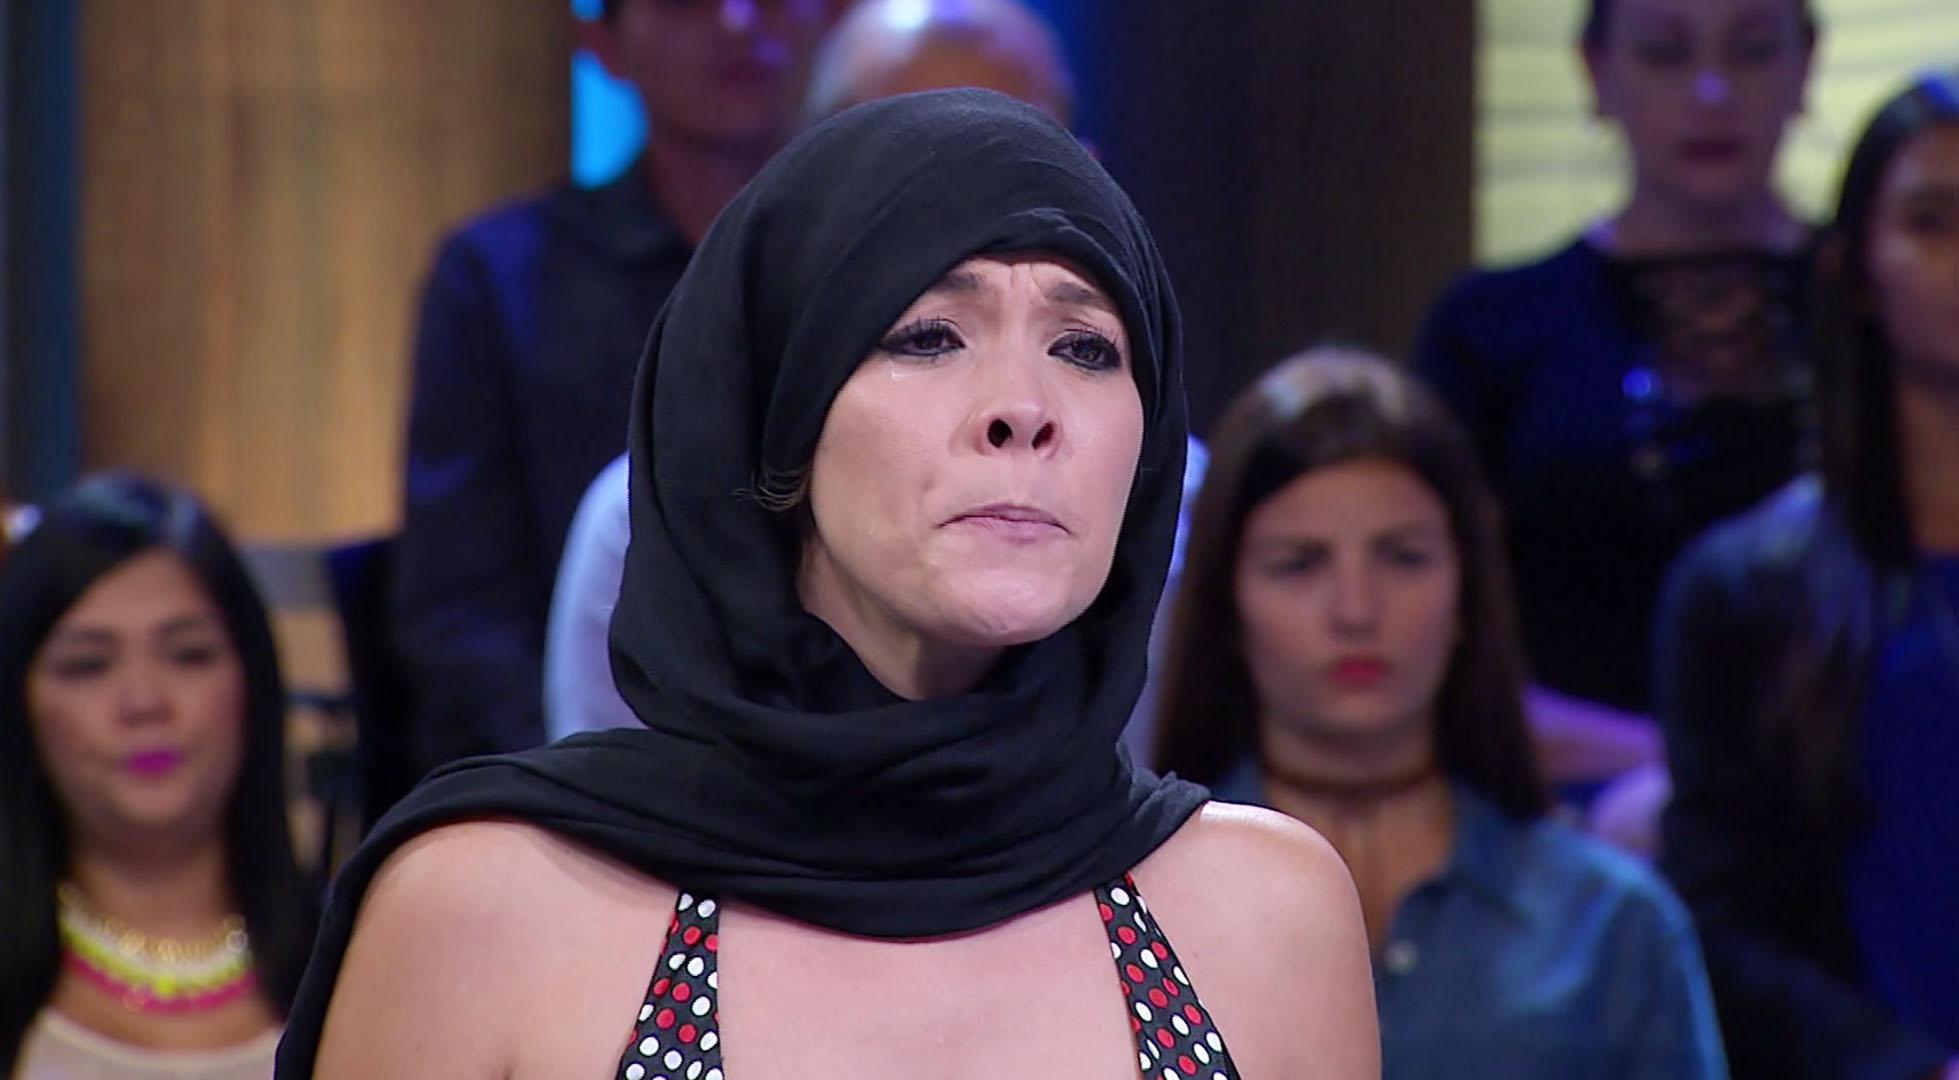 Porno a la musulmana Caso Cerrado (VIDEO) | Telemundo